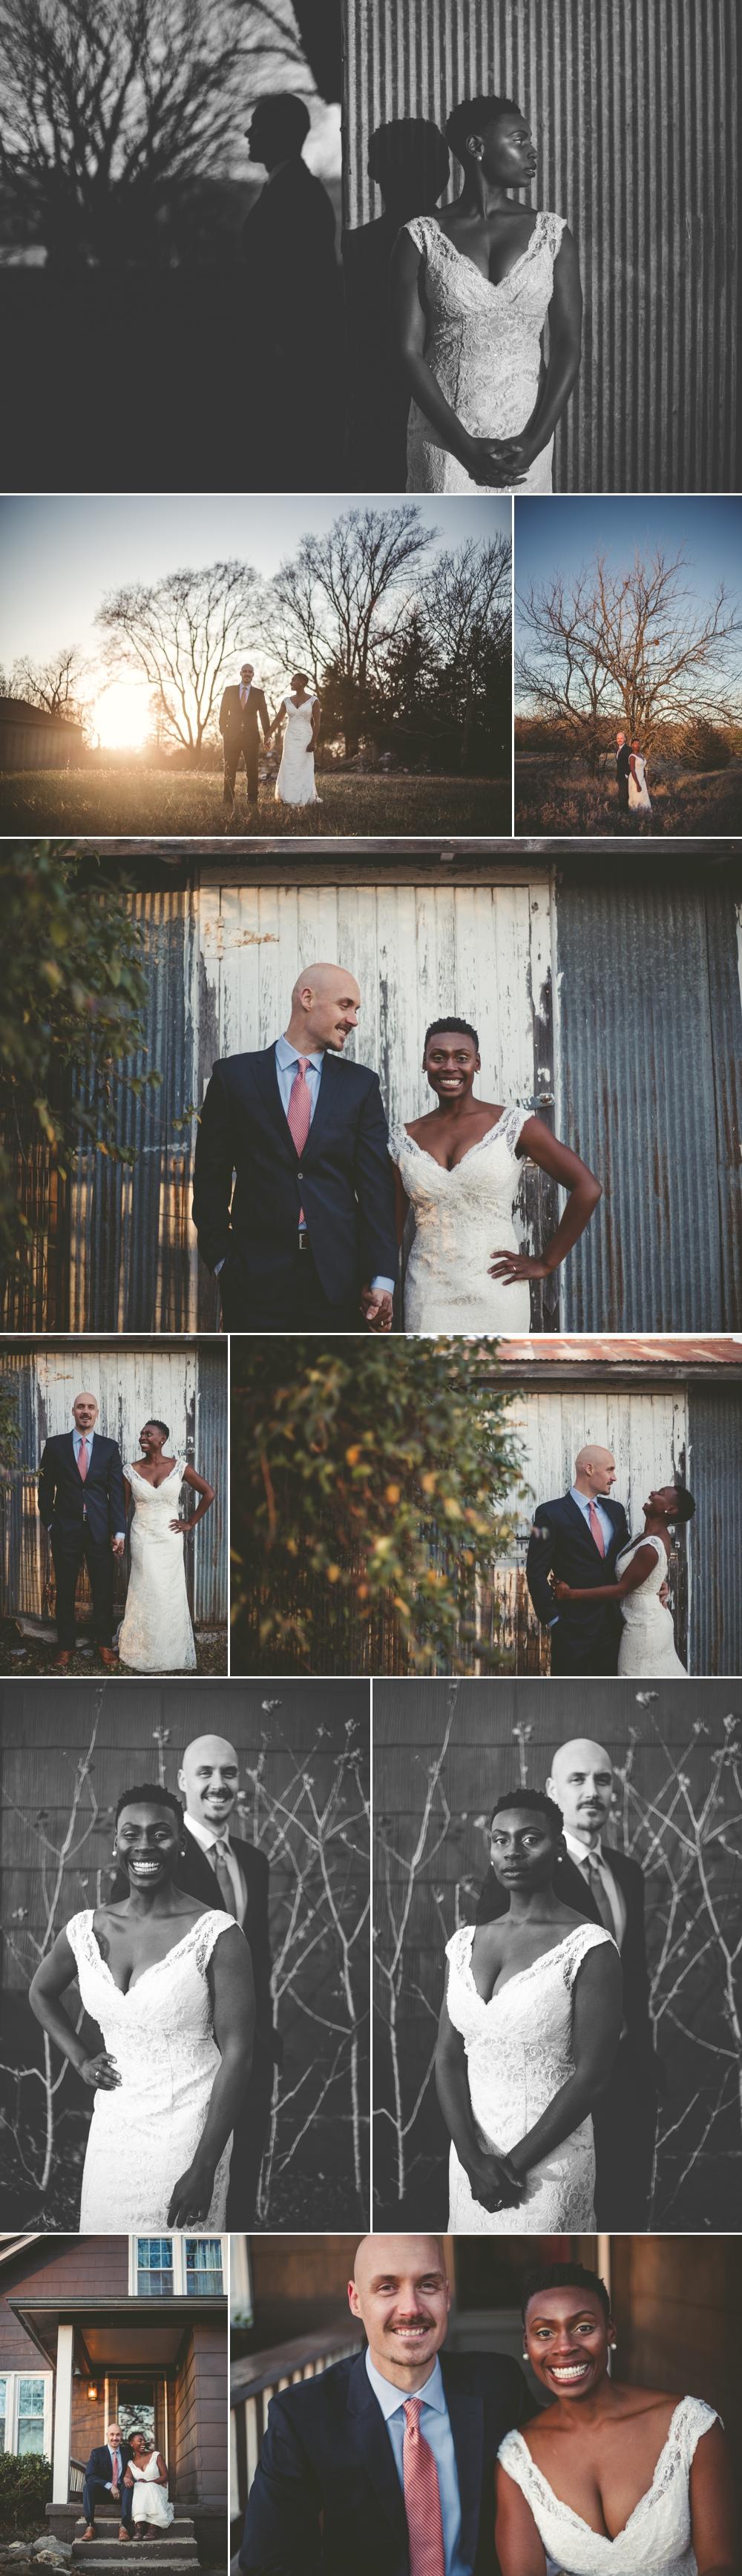 jason_domingues_photography_best_kansas_city_wedding_photographer_kc_weddings_farm.JPG